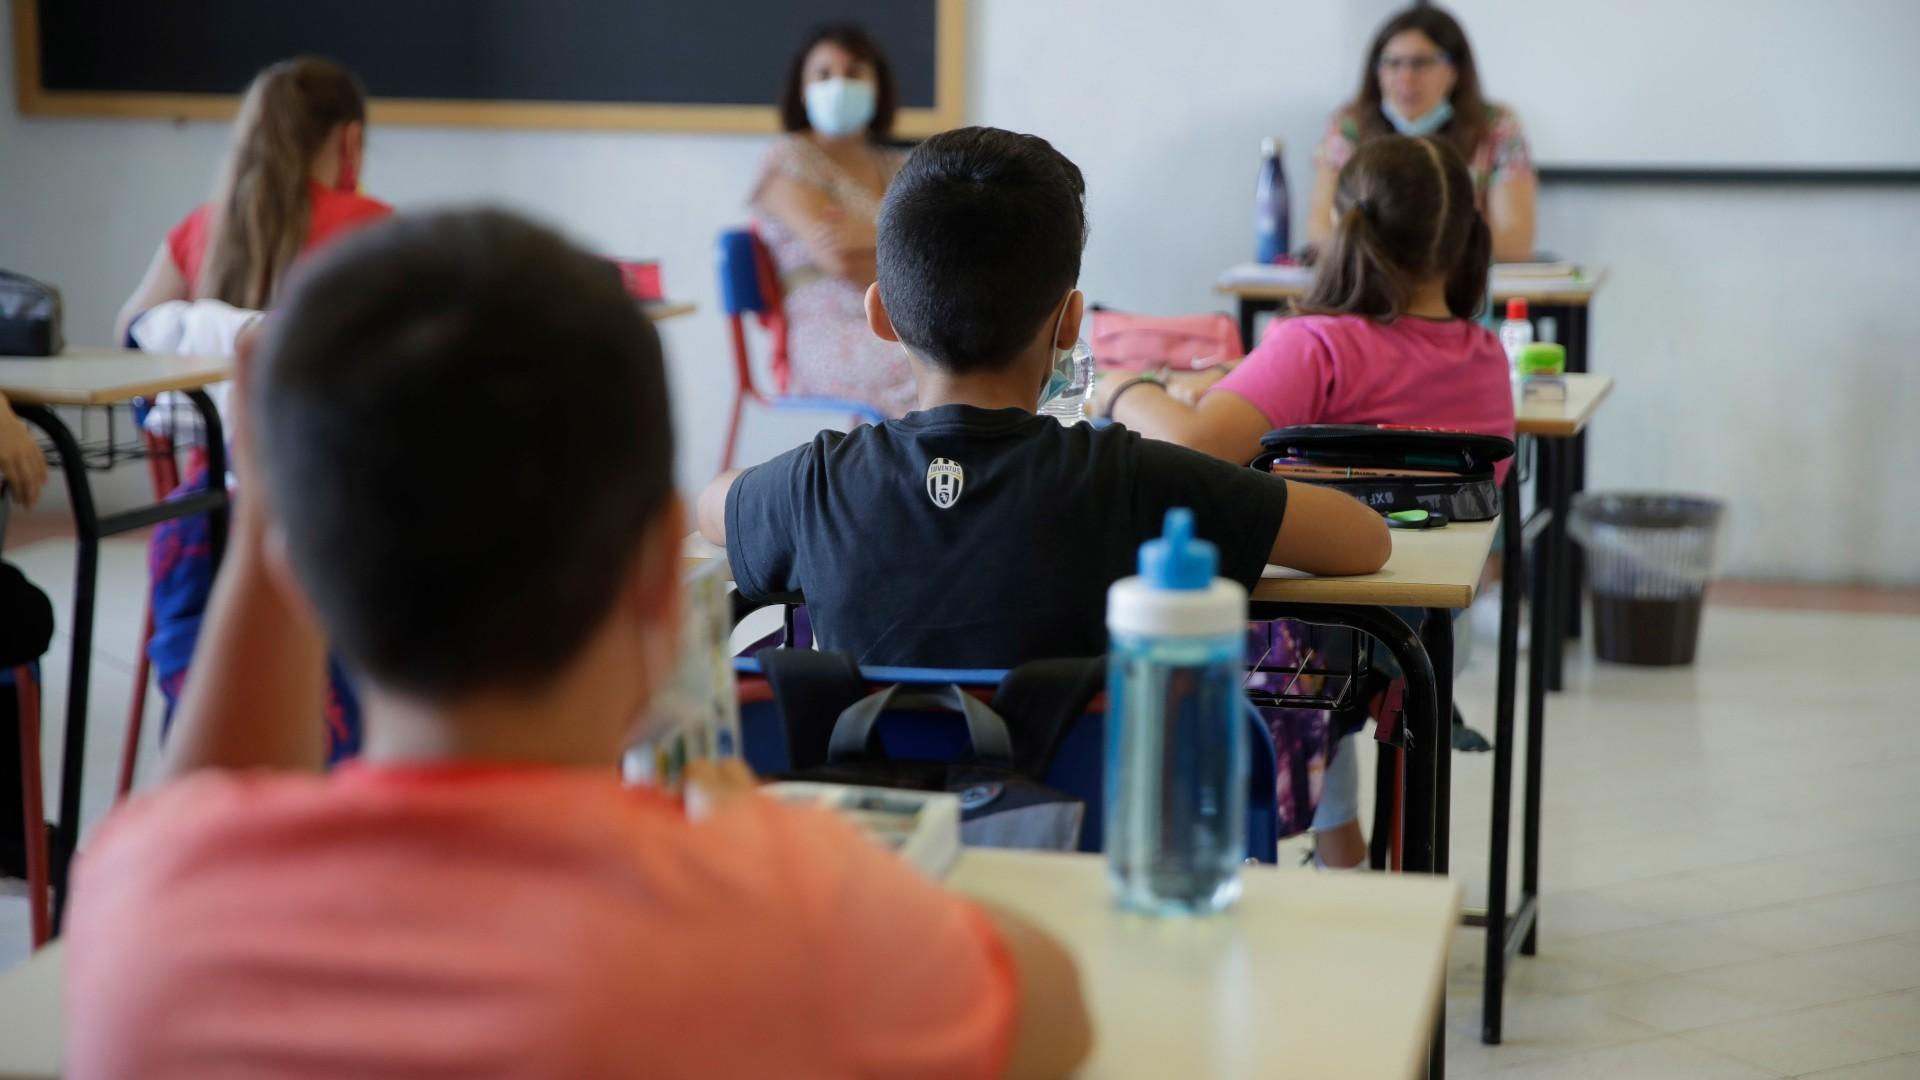 COVID-19 pandemic worsens OCD symptoms in children